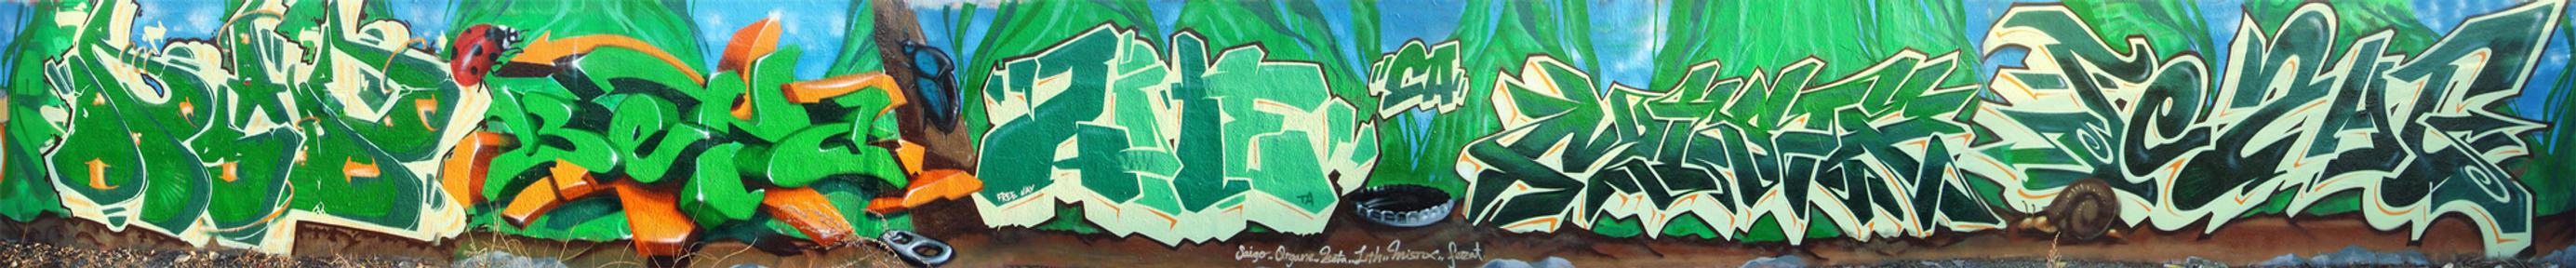 CA. GrassRoots by Fezat1